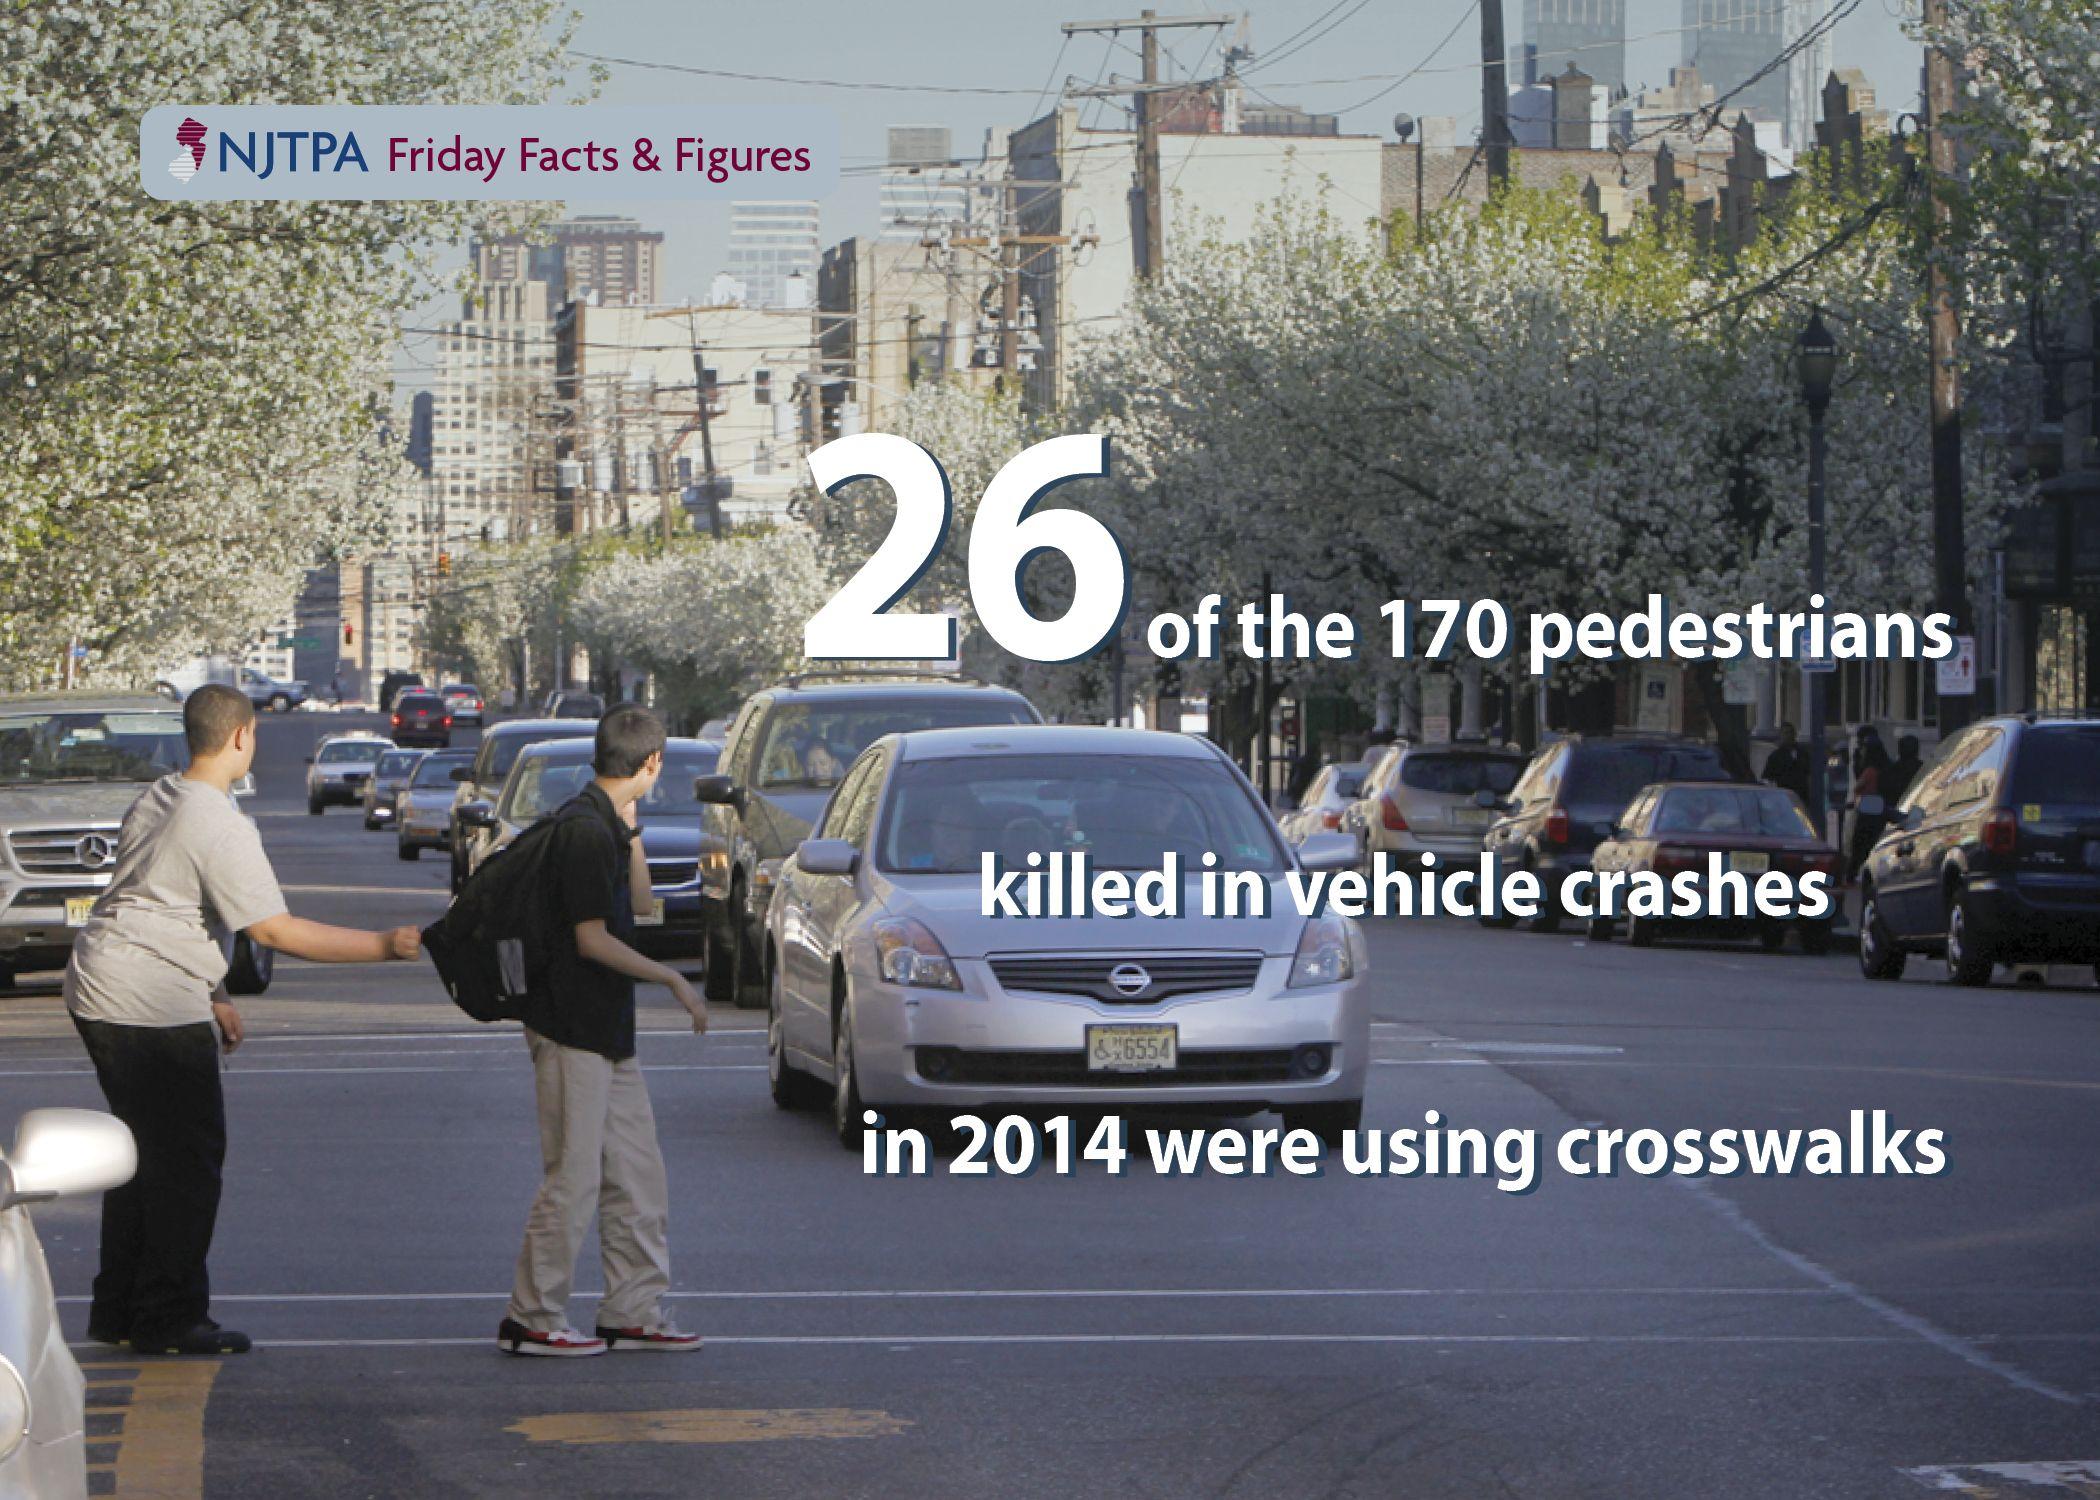 Even Crosswalks Can Be A Dangerous Place For Pedestrians